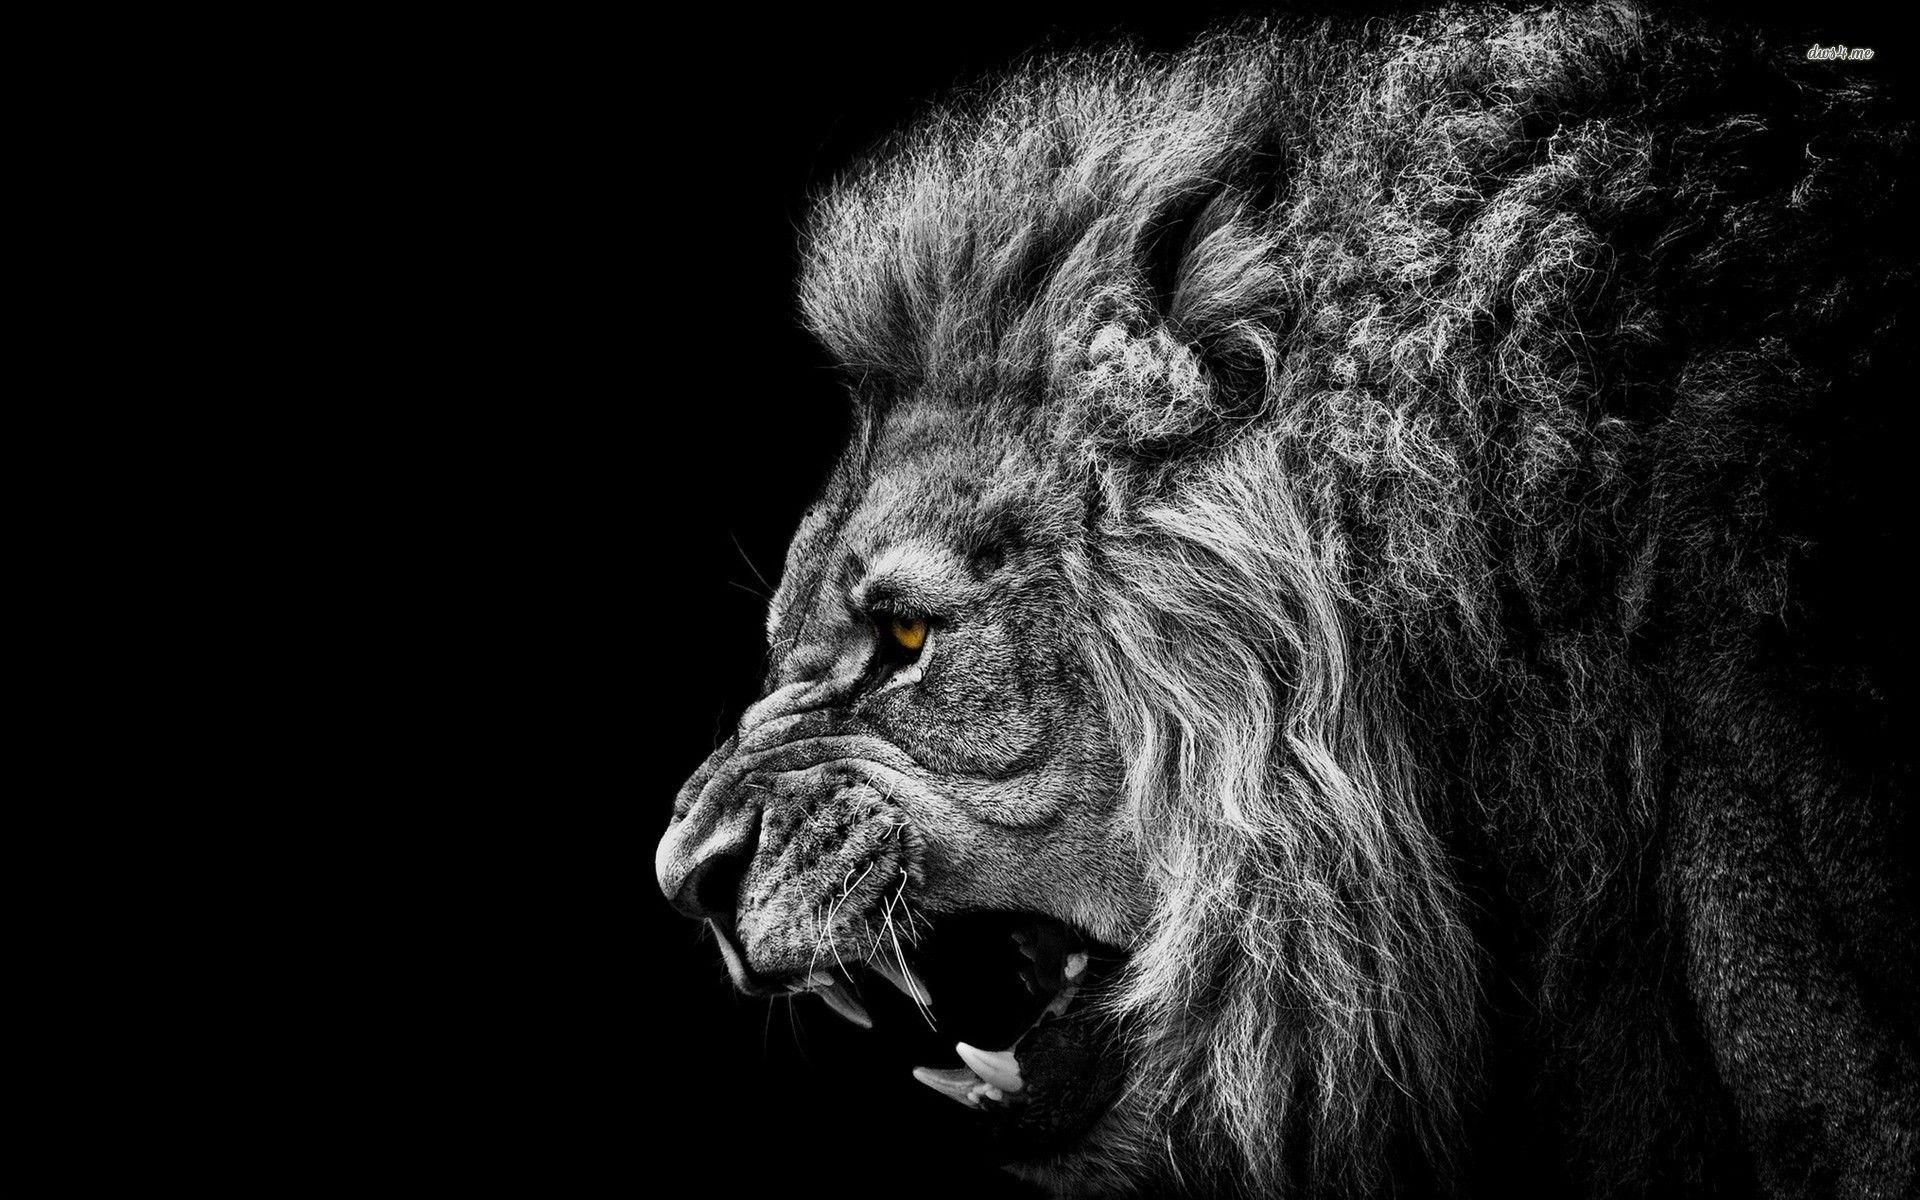 Roaring Wallpapers Black And White Lion Lion Wallpaper Lion Hd Wallpaper